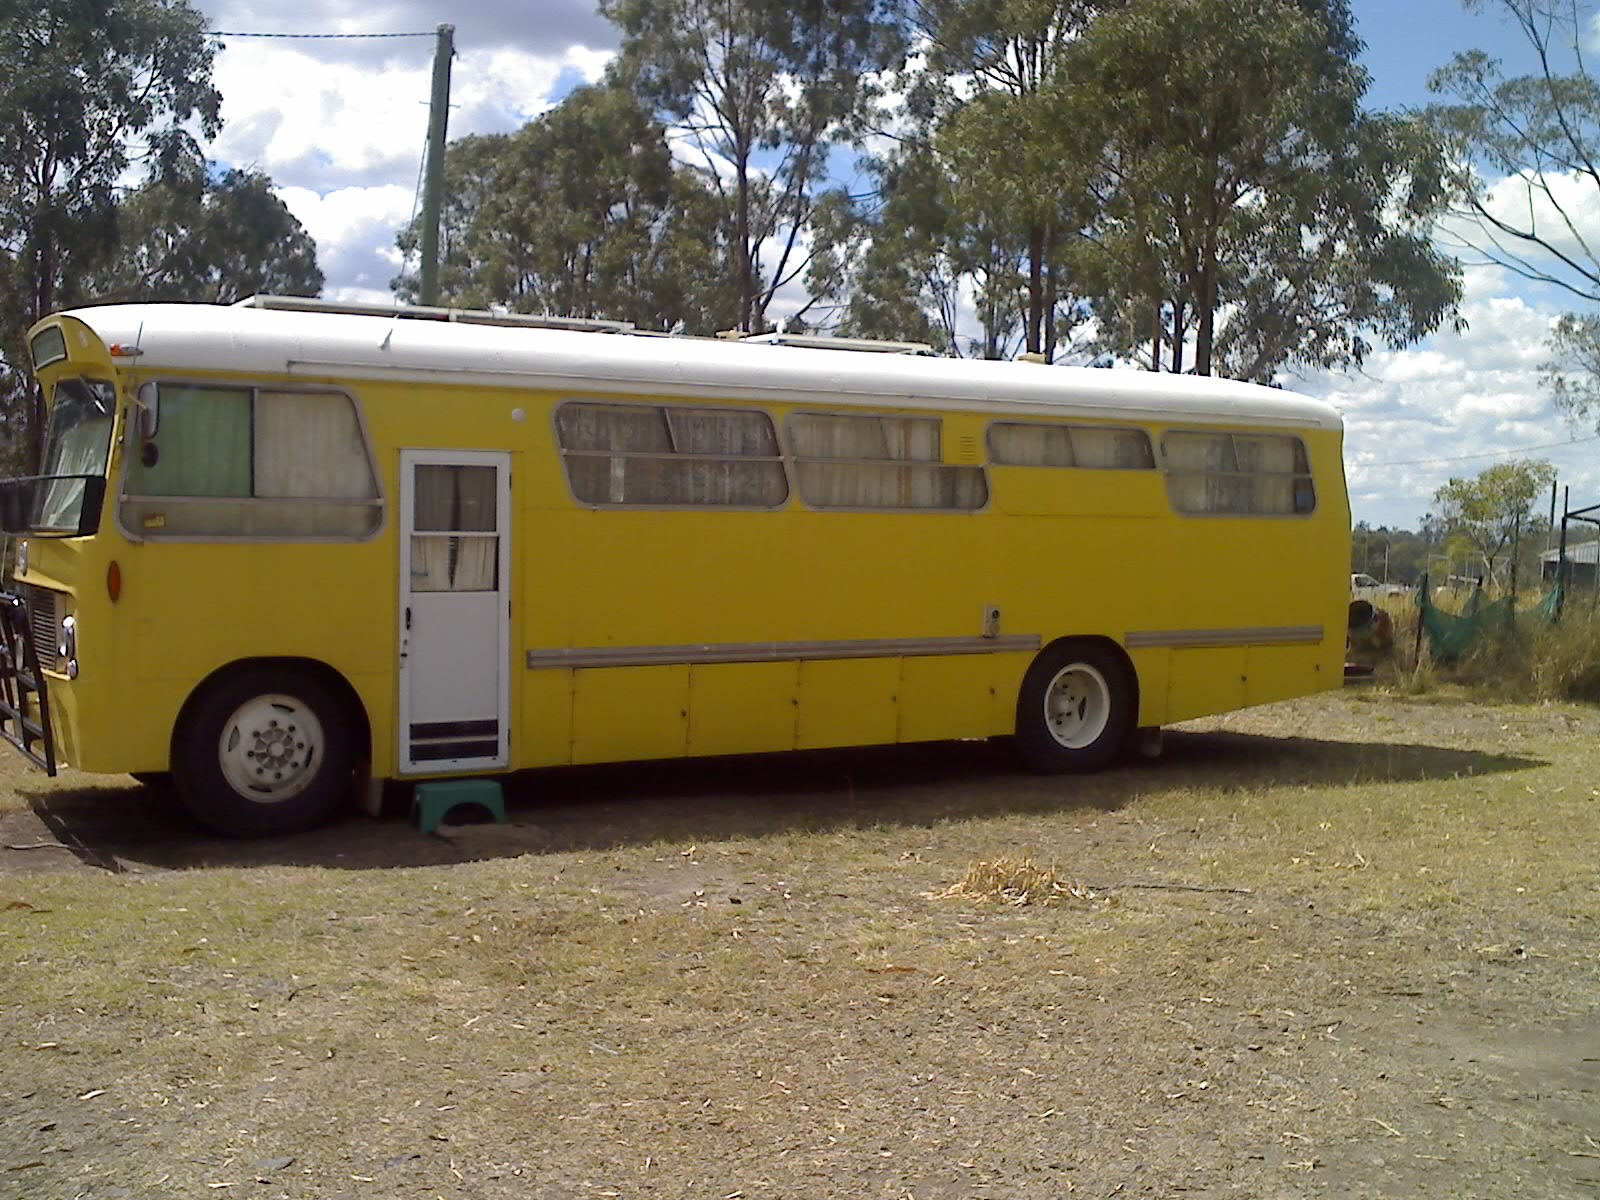 The Big Yellow Bus